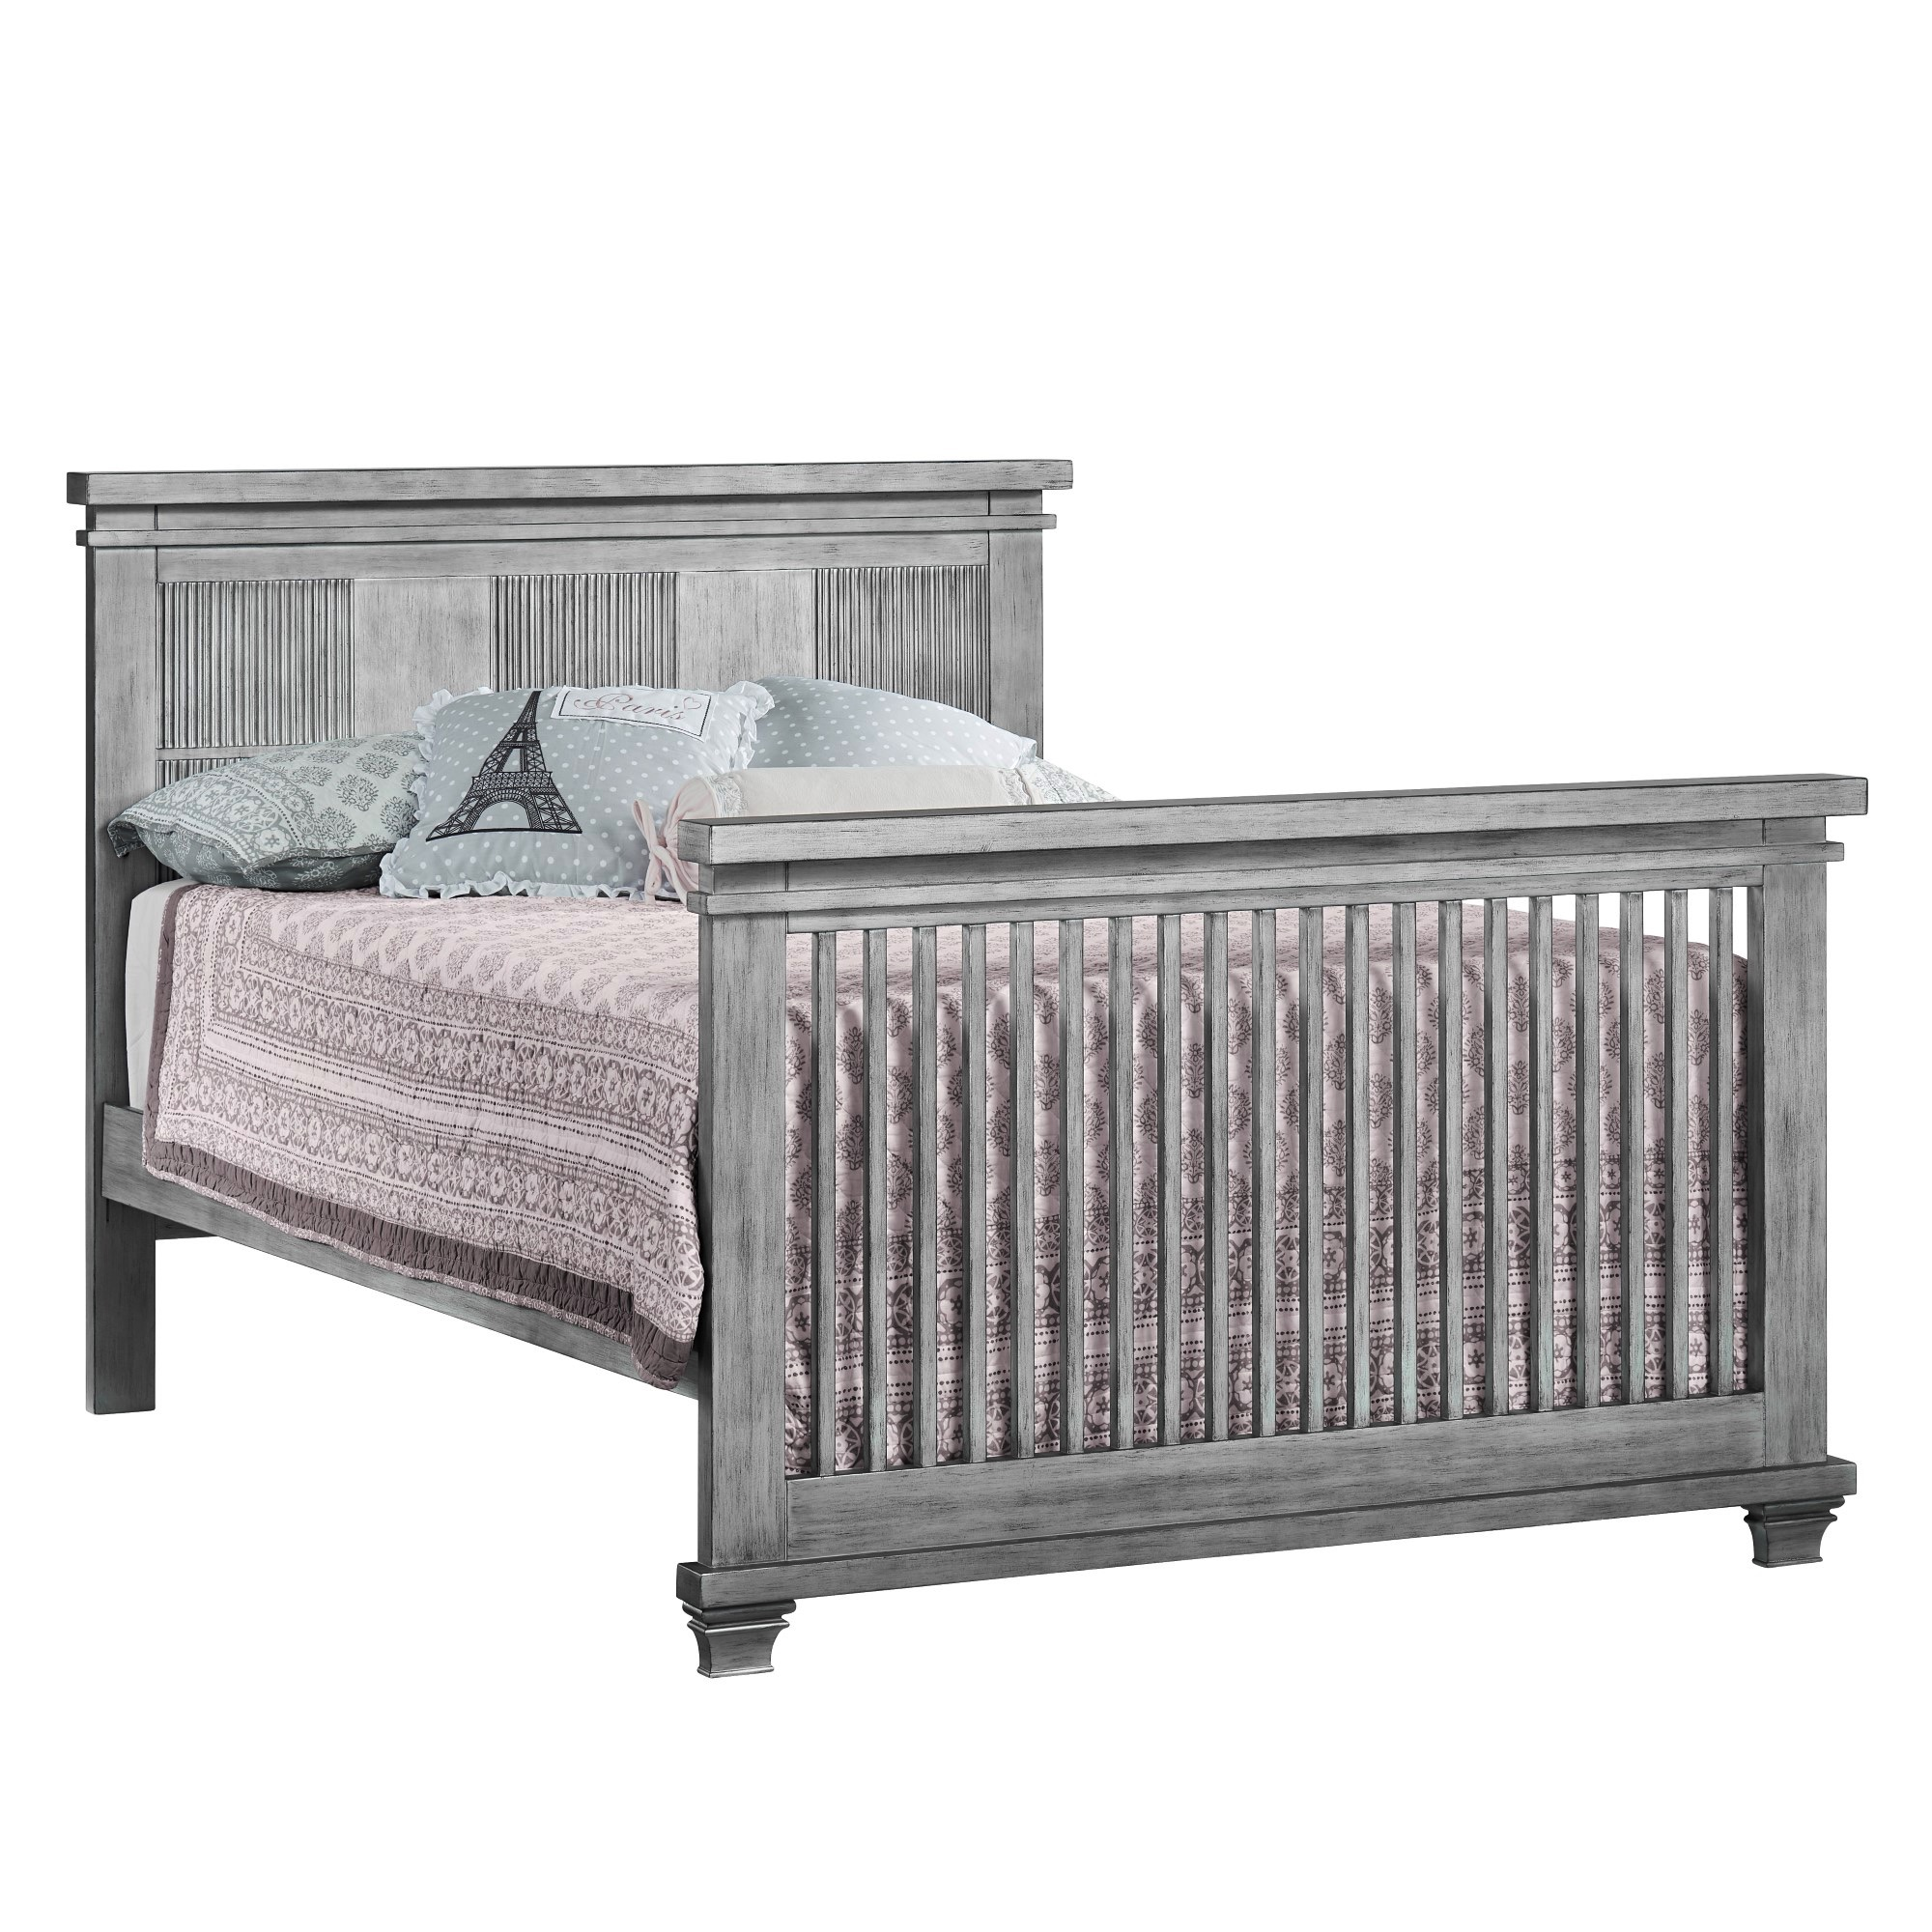 Full Bed Conversion Kit Piermont Rustic Stonington Gray